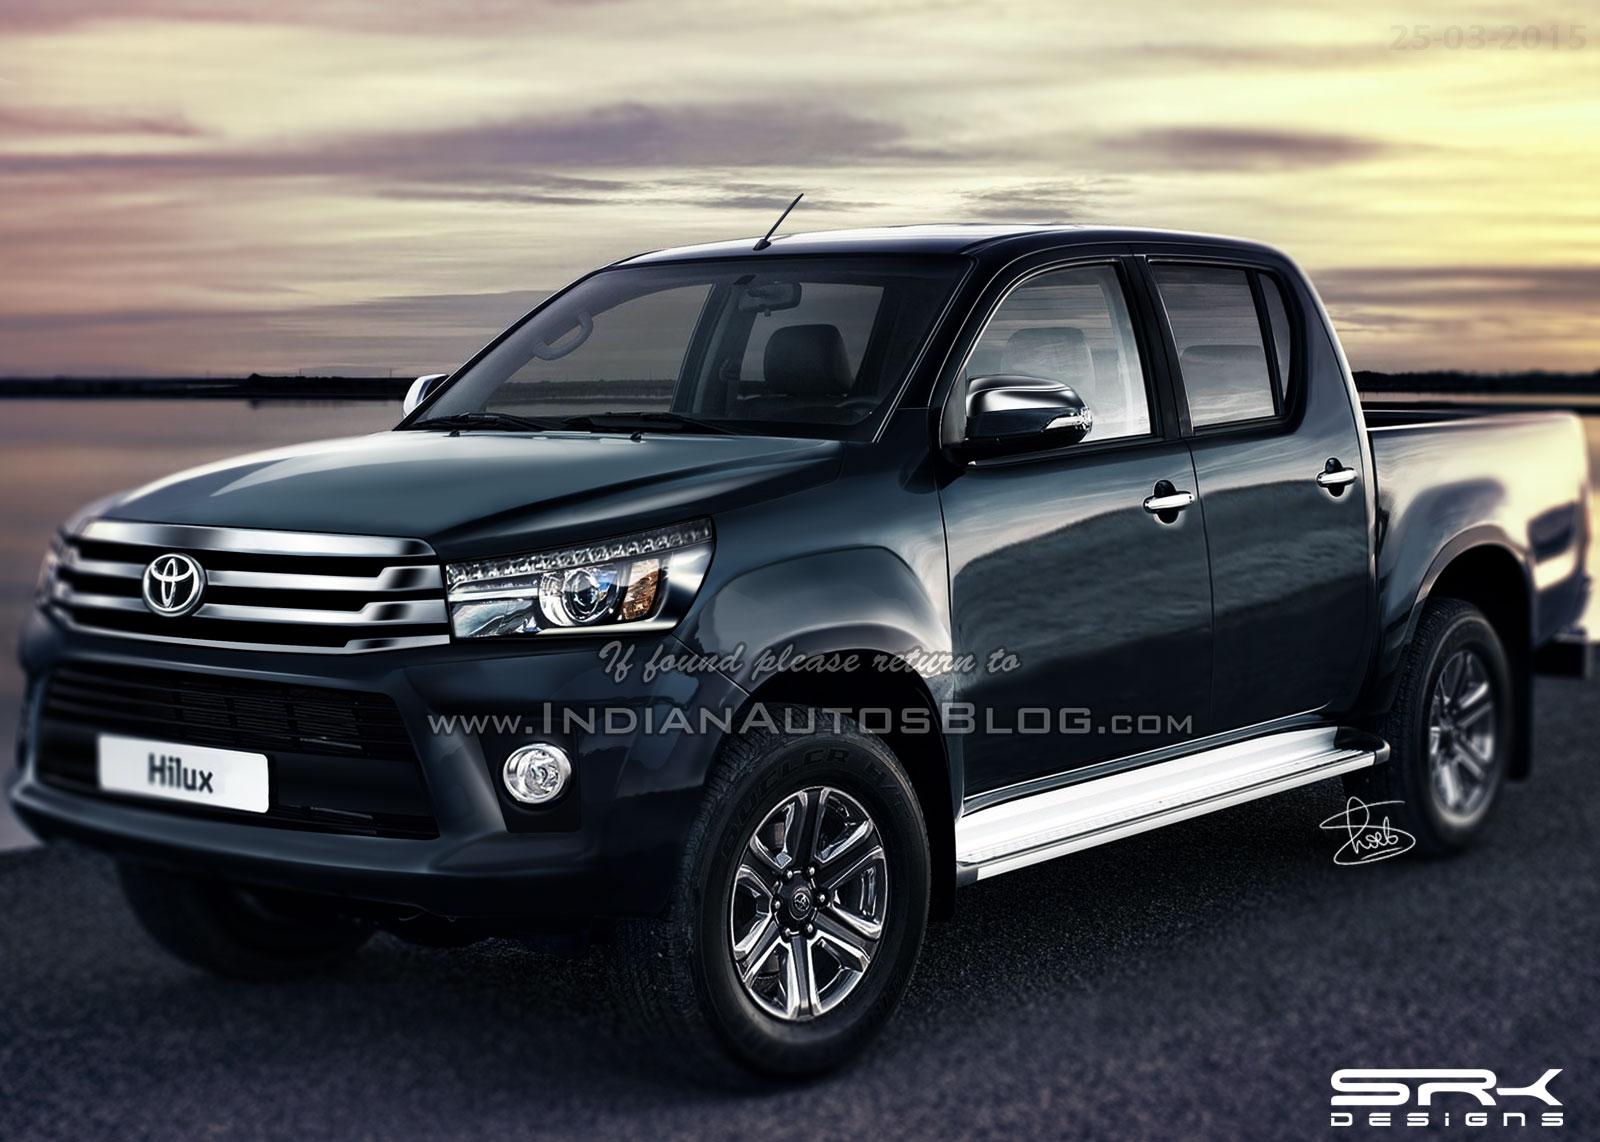 Kelebihan Kekurangan Harga Toyota Hilux Top Model Tahun Ini